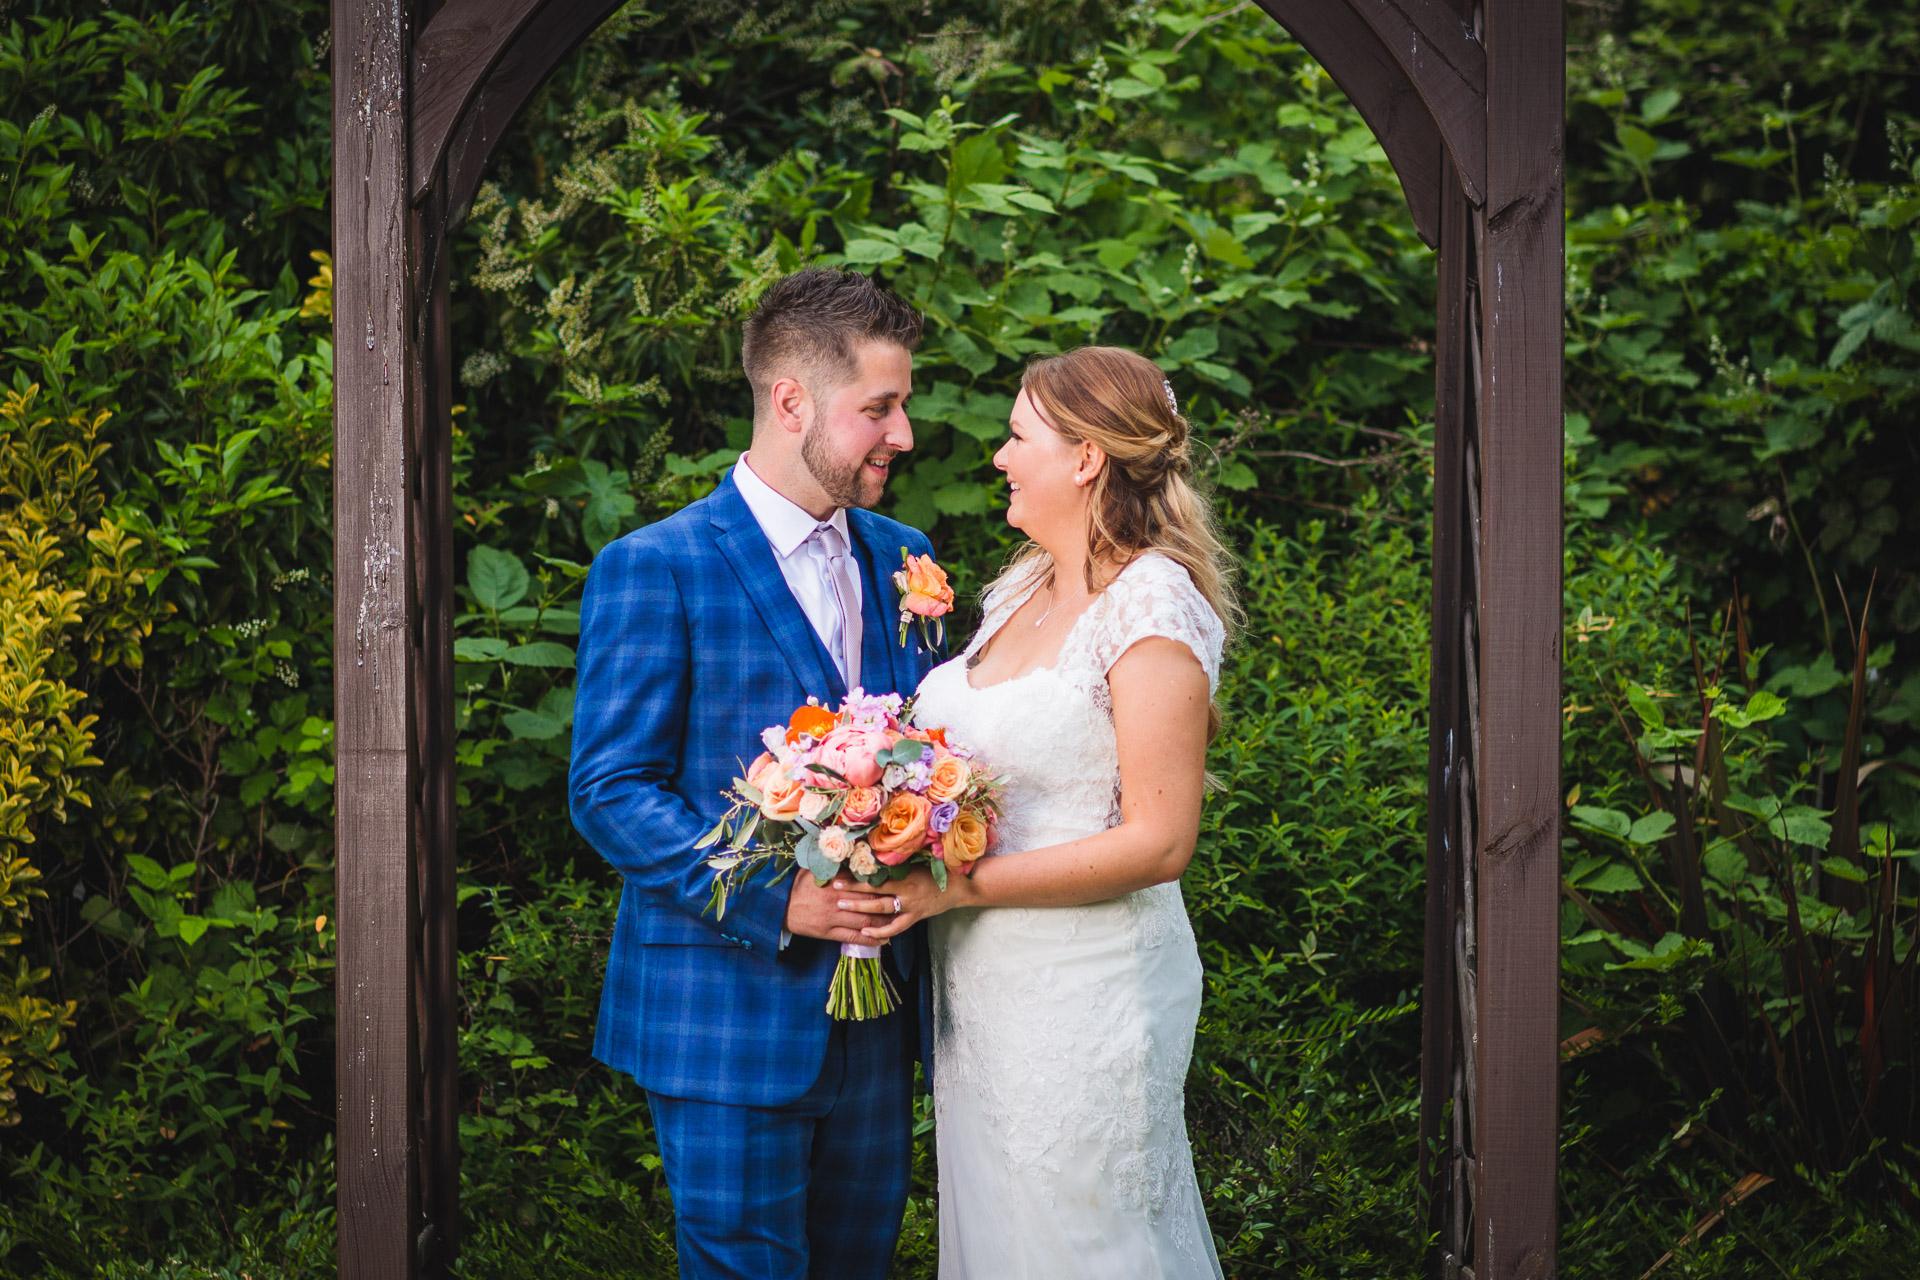 Wedding in The Mandolay Hotel, Guildford